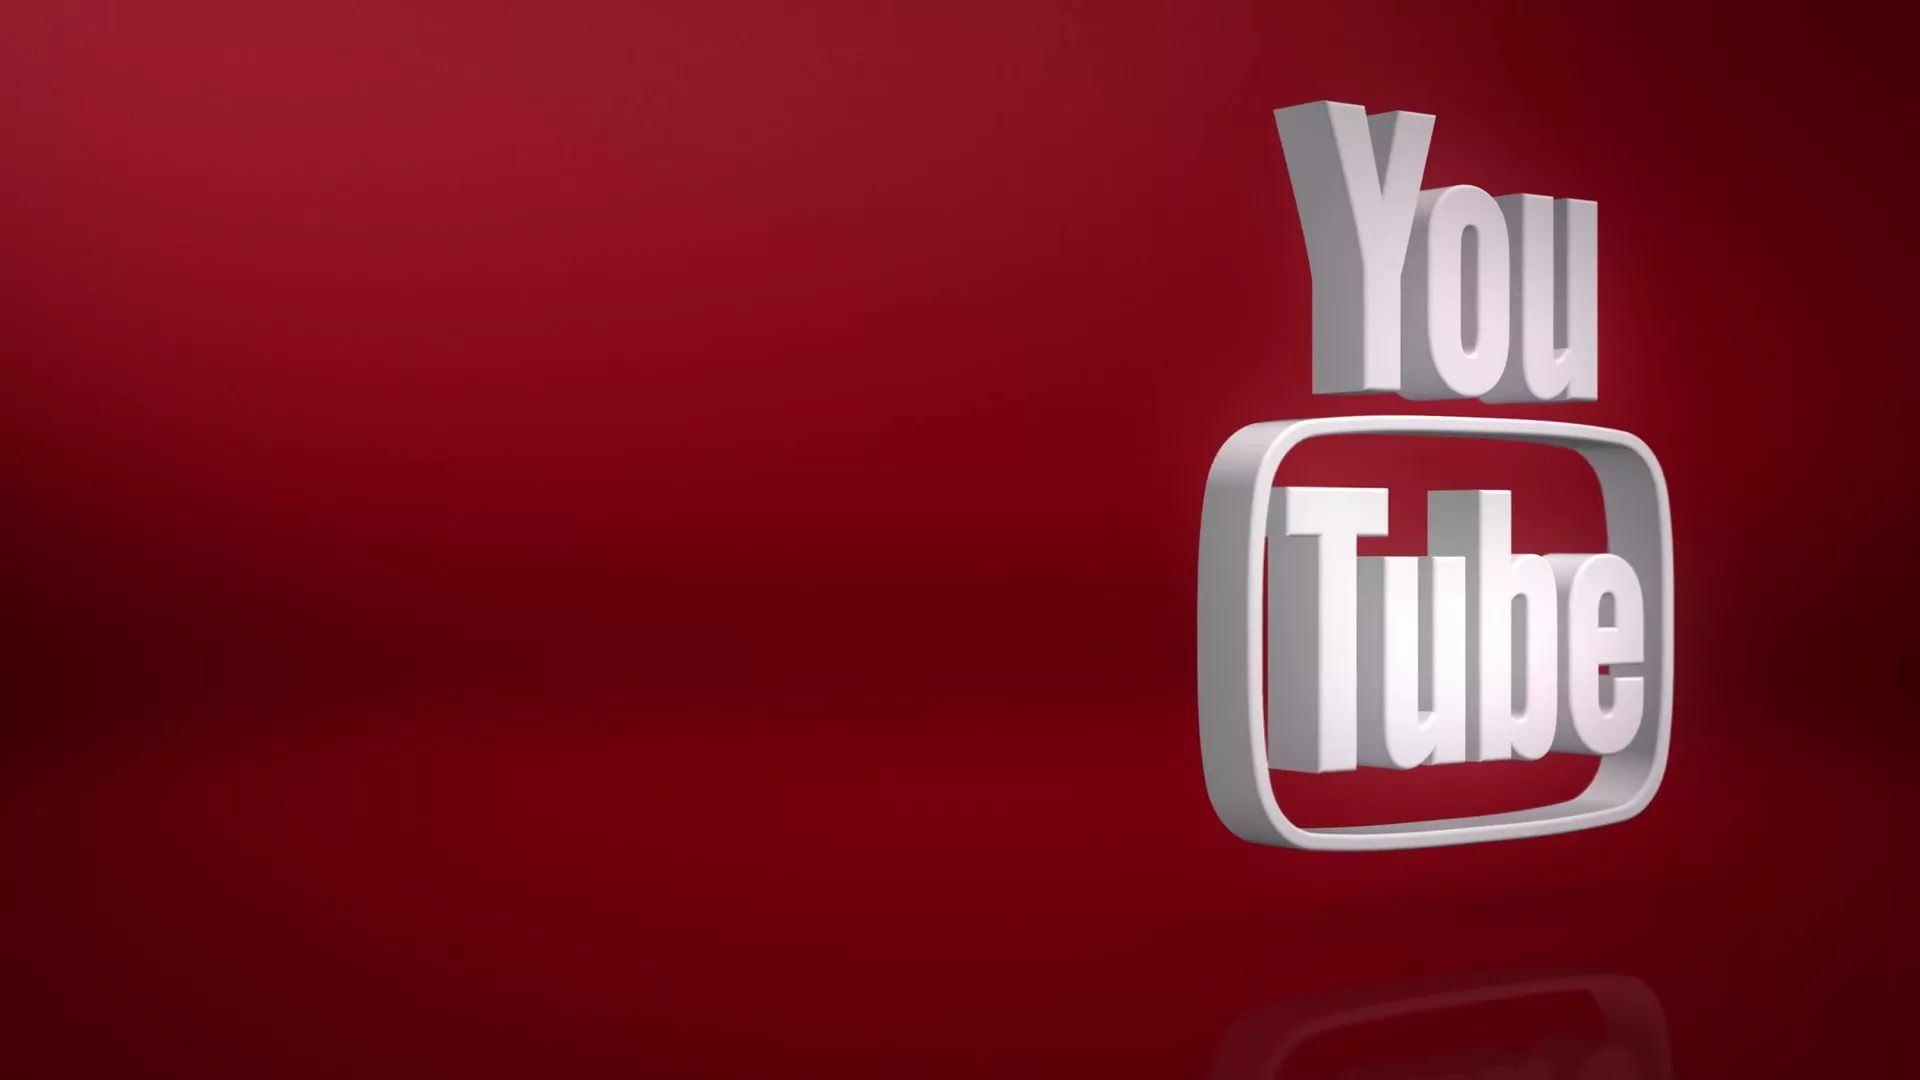 Youtube wallpaper theme